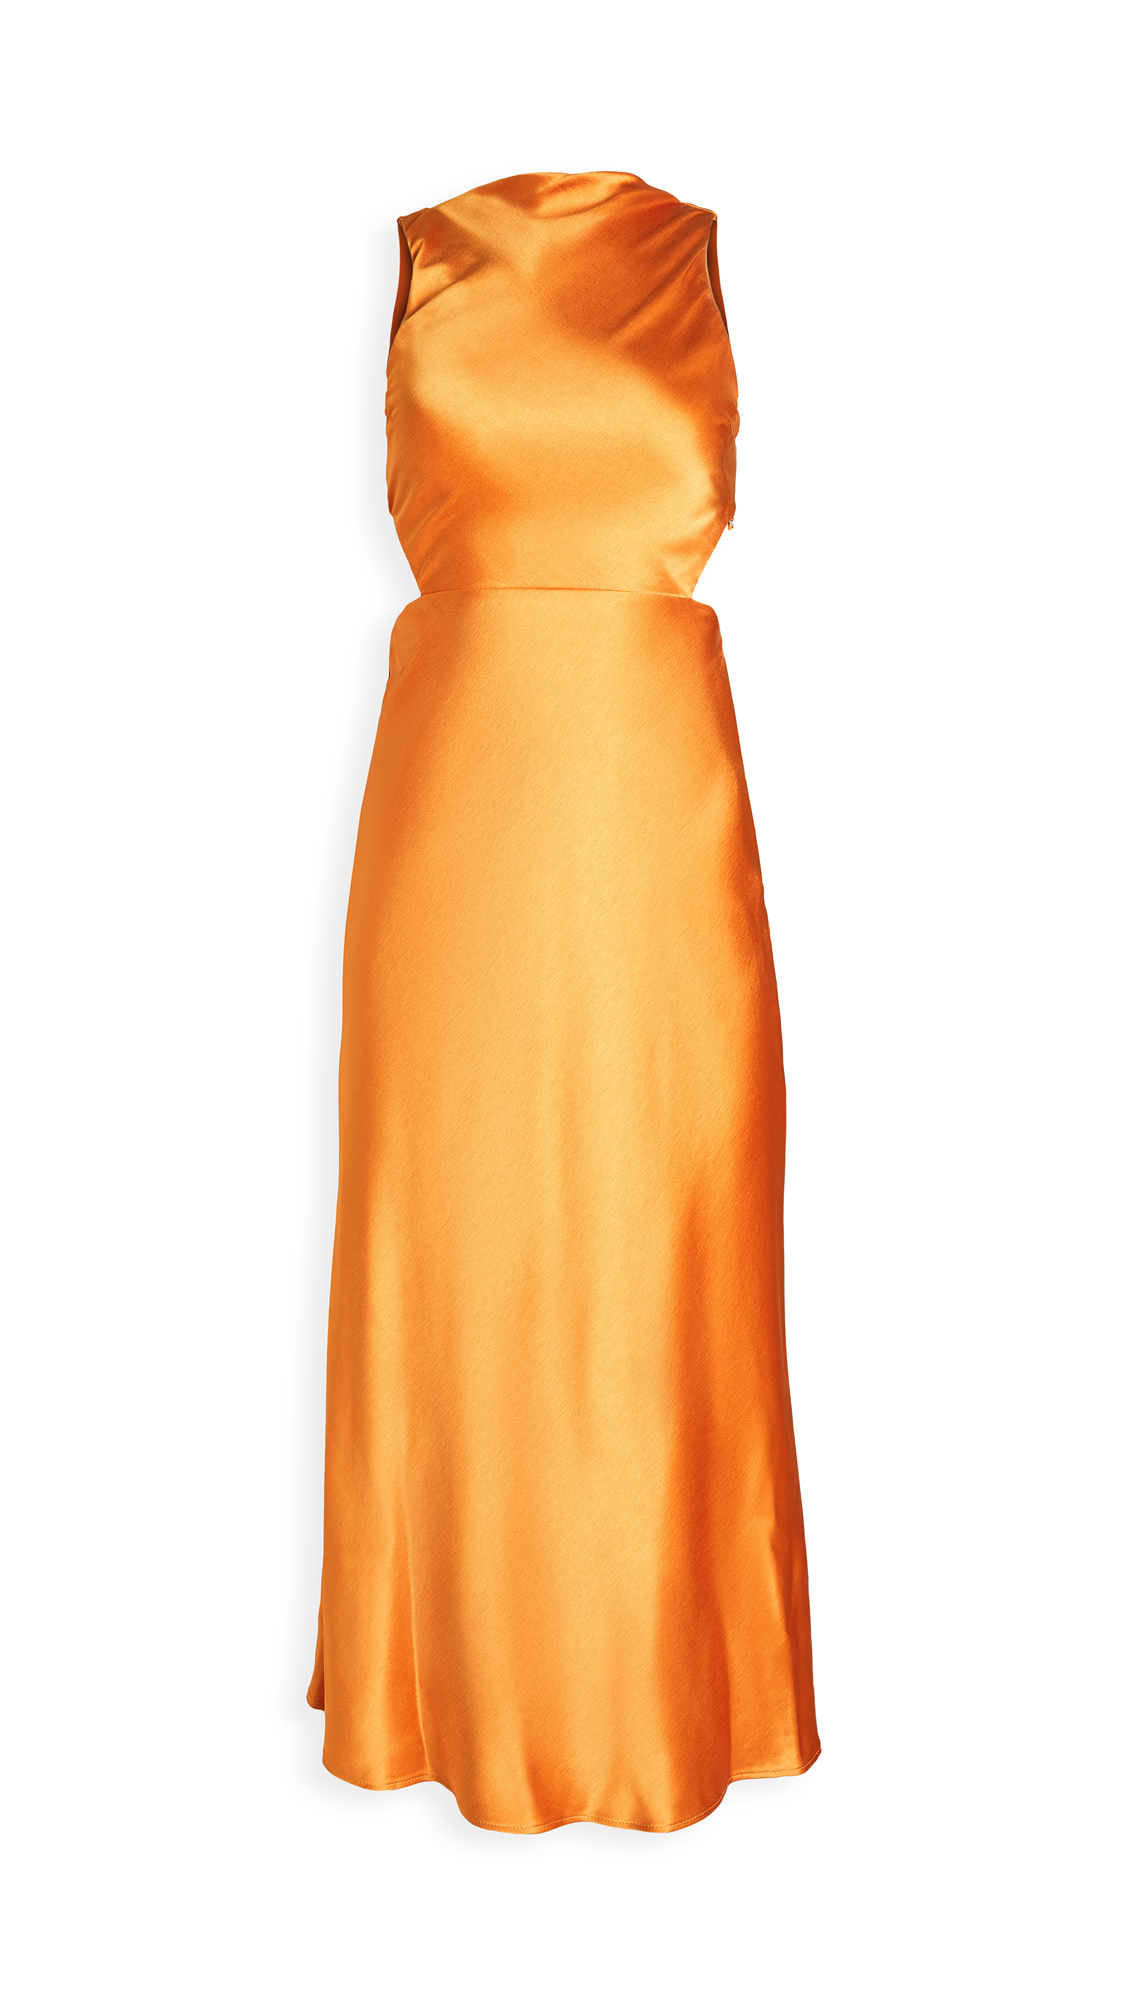 Photo of Bec & Bridge Seraphine Cutout Midi Dress - shop Bec & Bridge Clothing, Dresses online